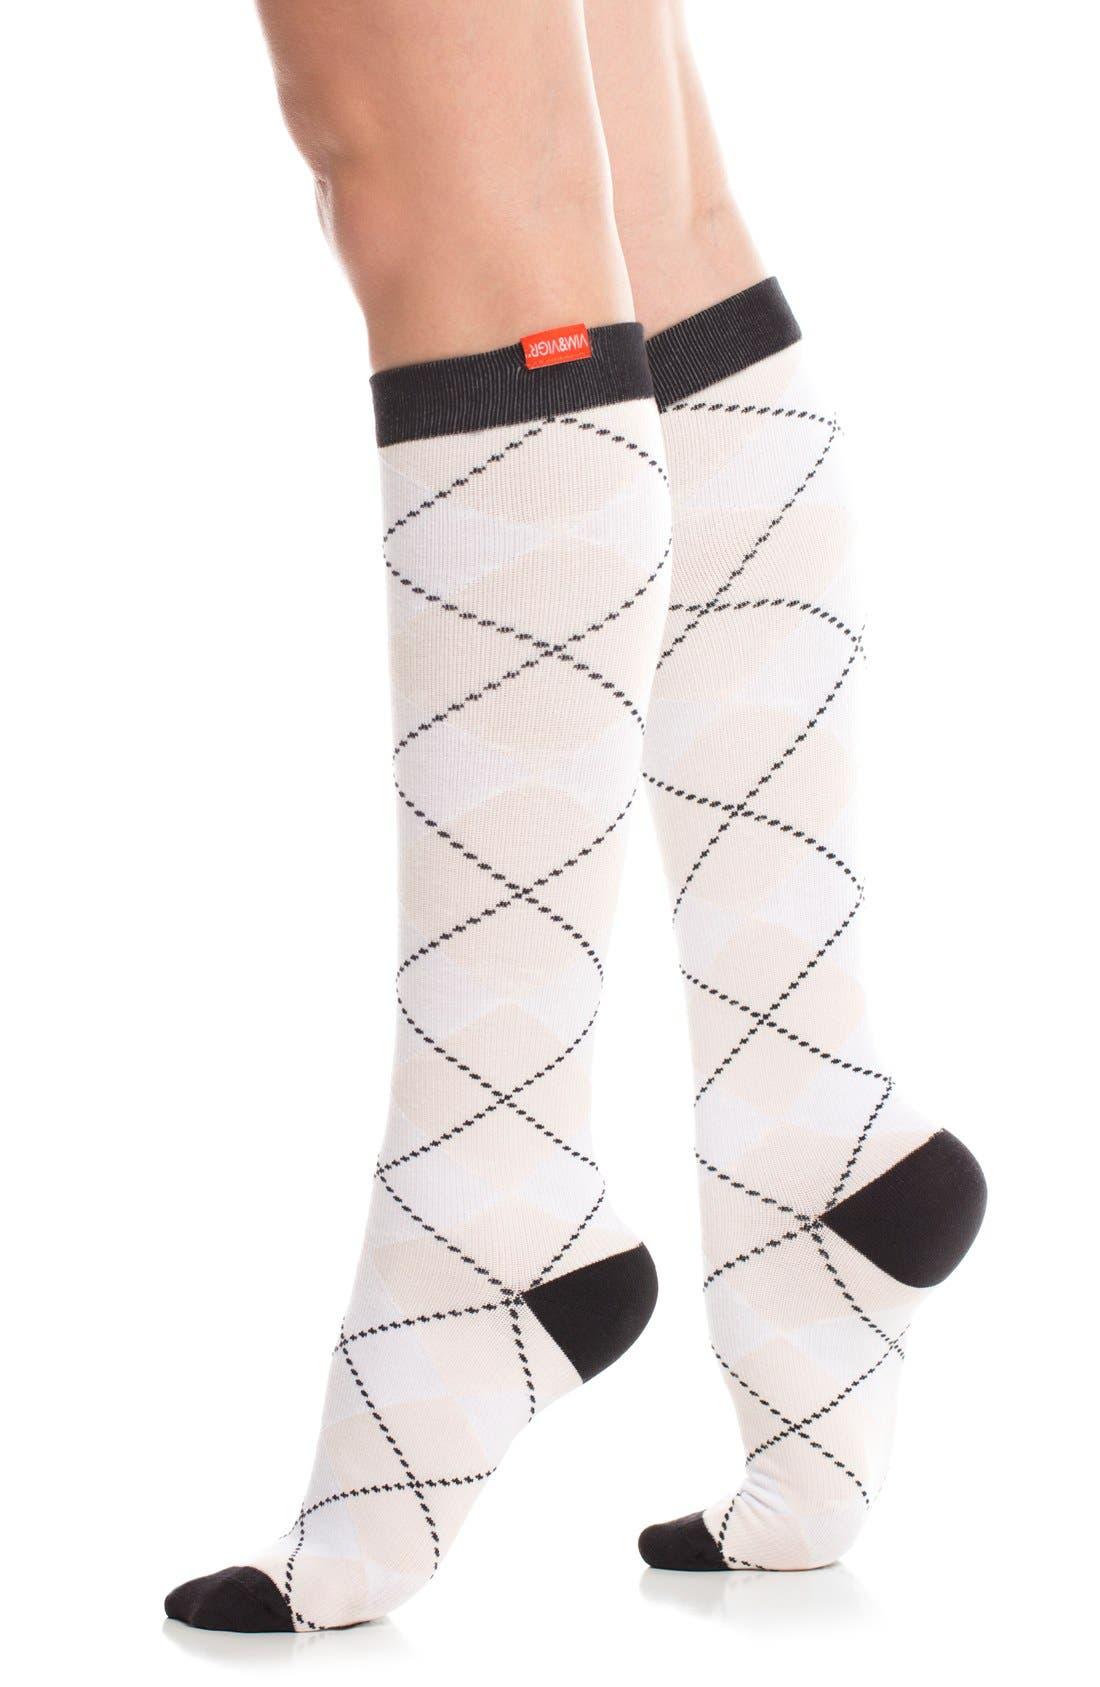 Main Image - VIM & VIGR Argyle Graduated Compression Trouser Socks